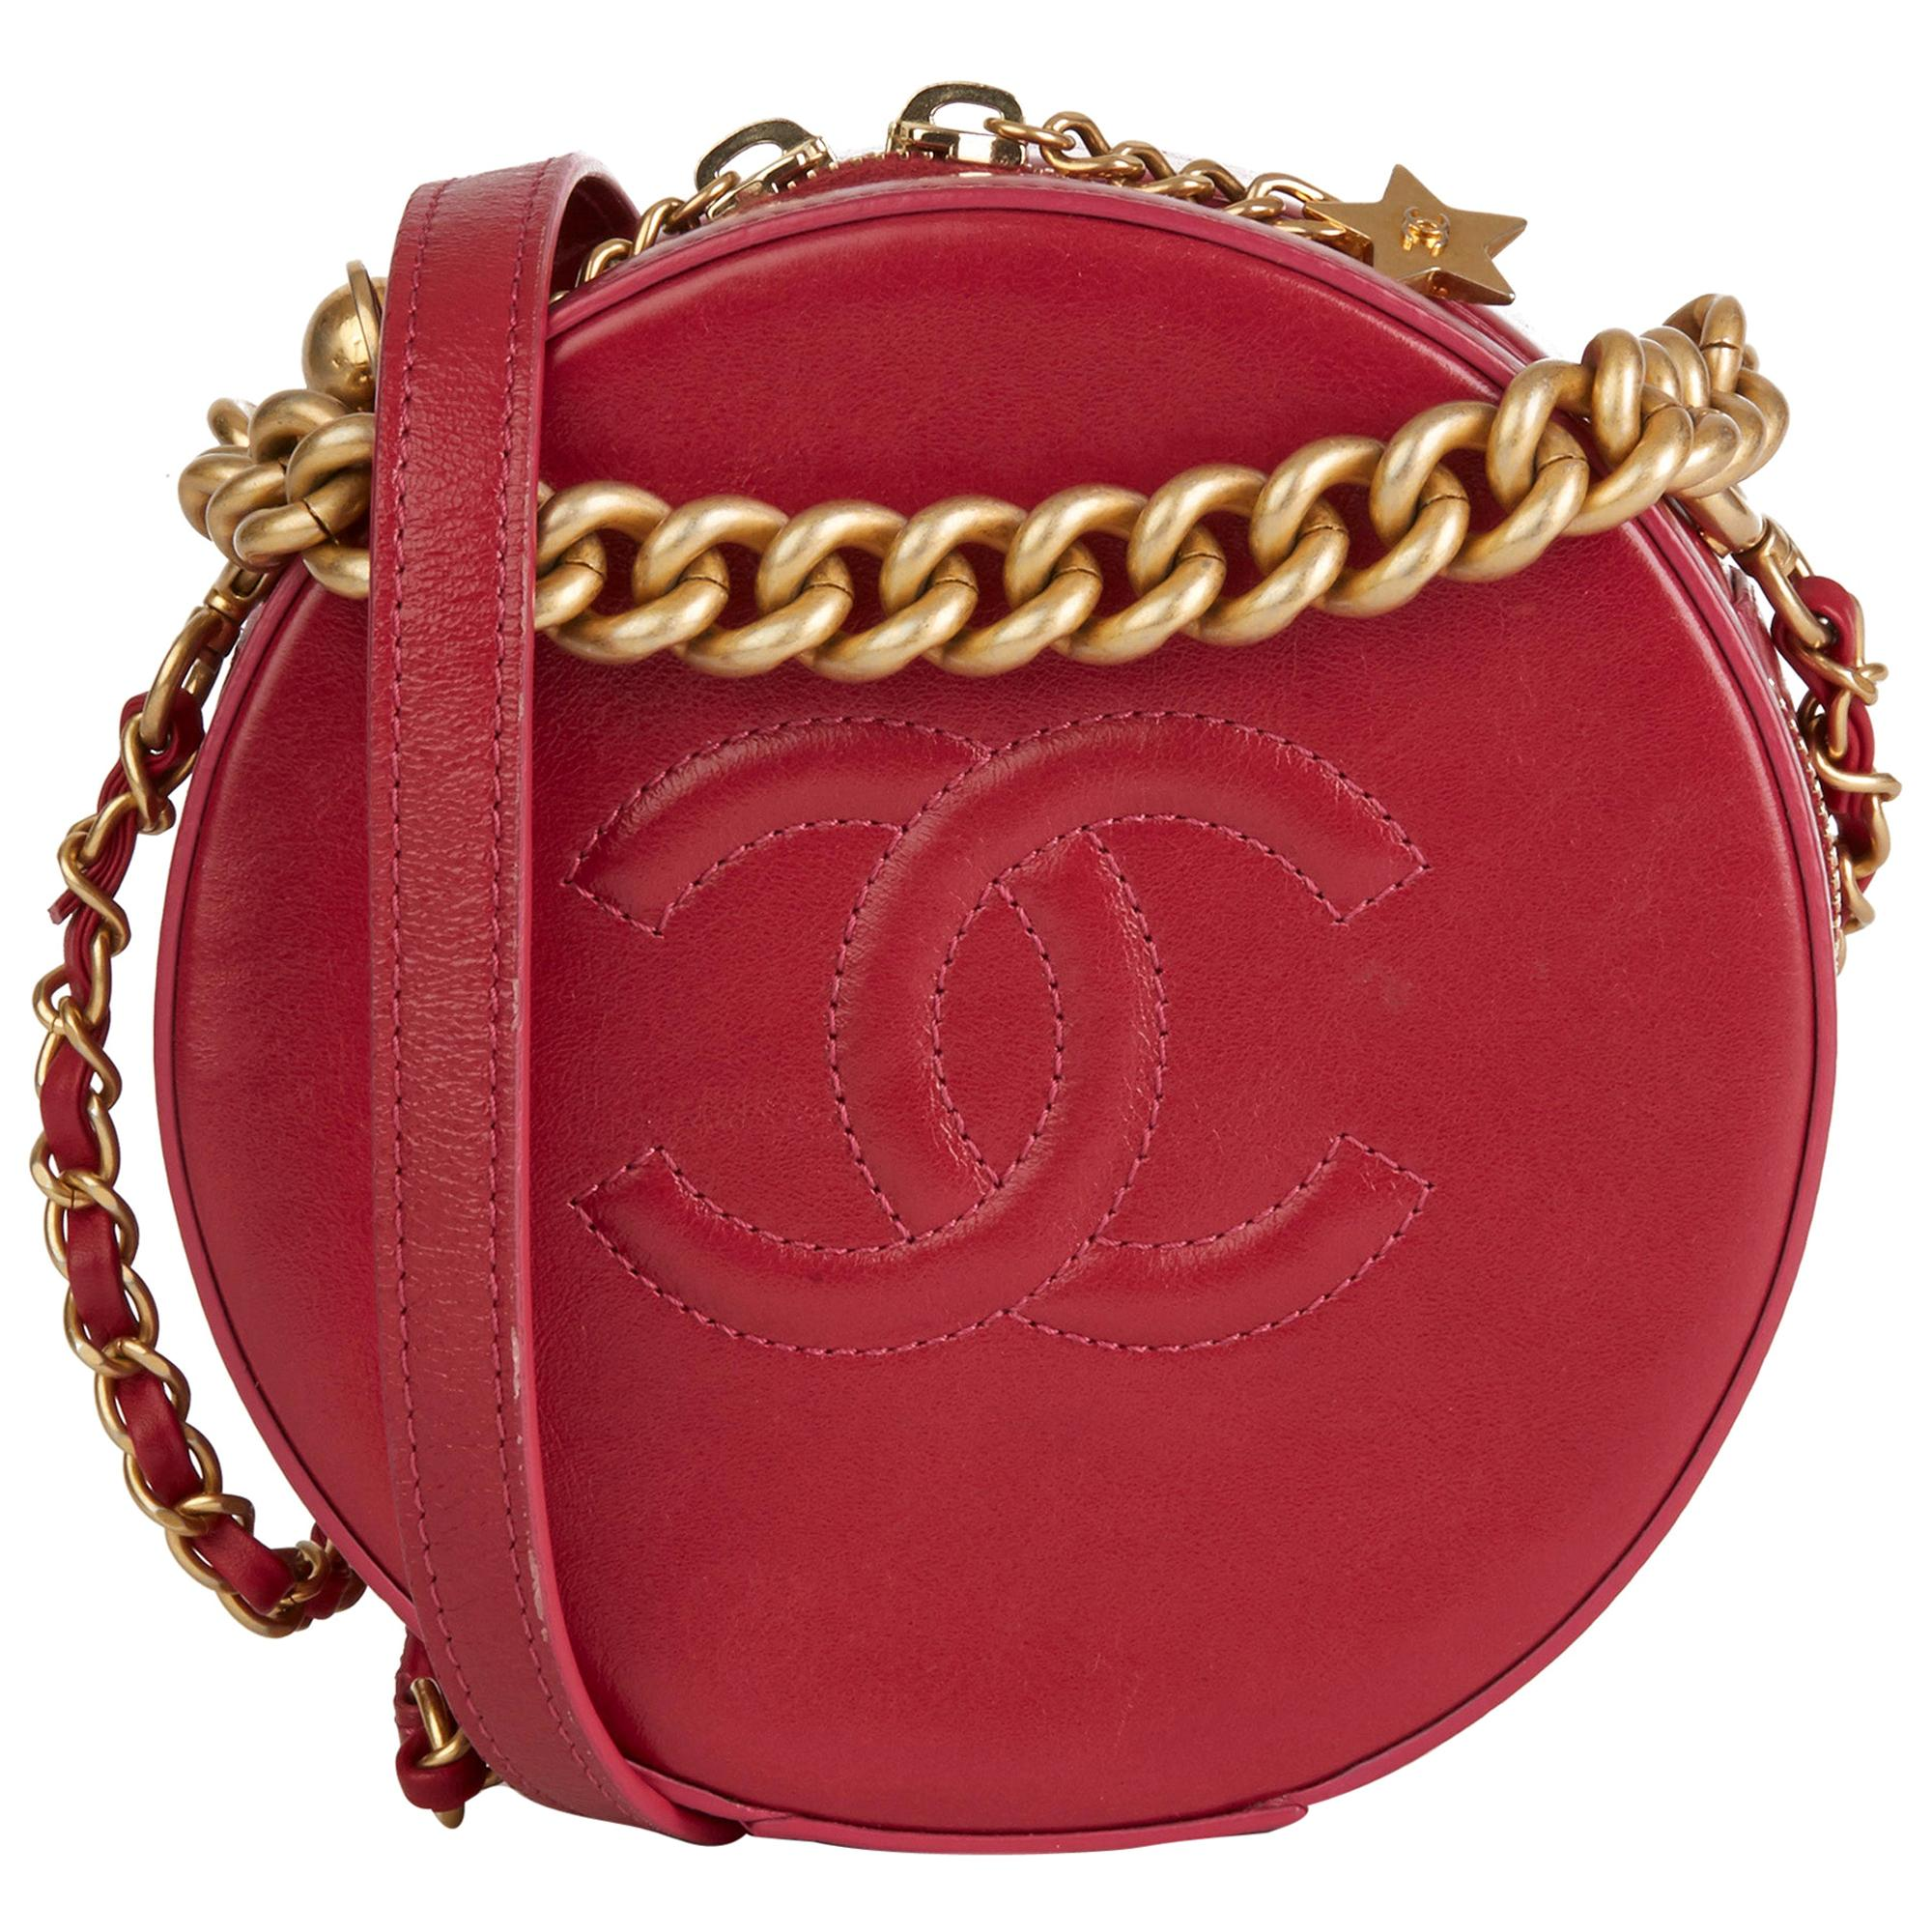 2018 Chanel Raspberry Glazed Calfskin Leather Round as Earth Bag